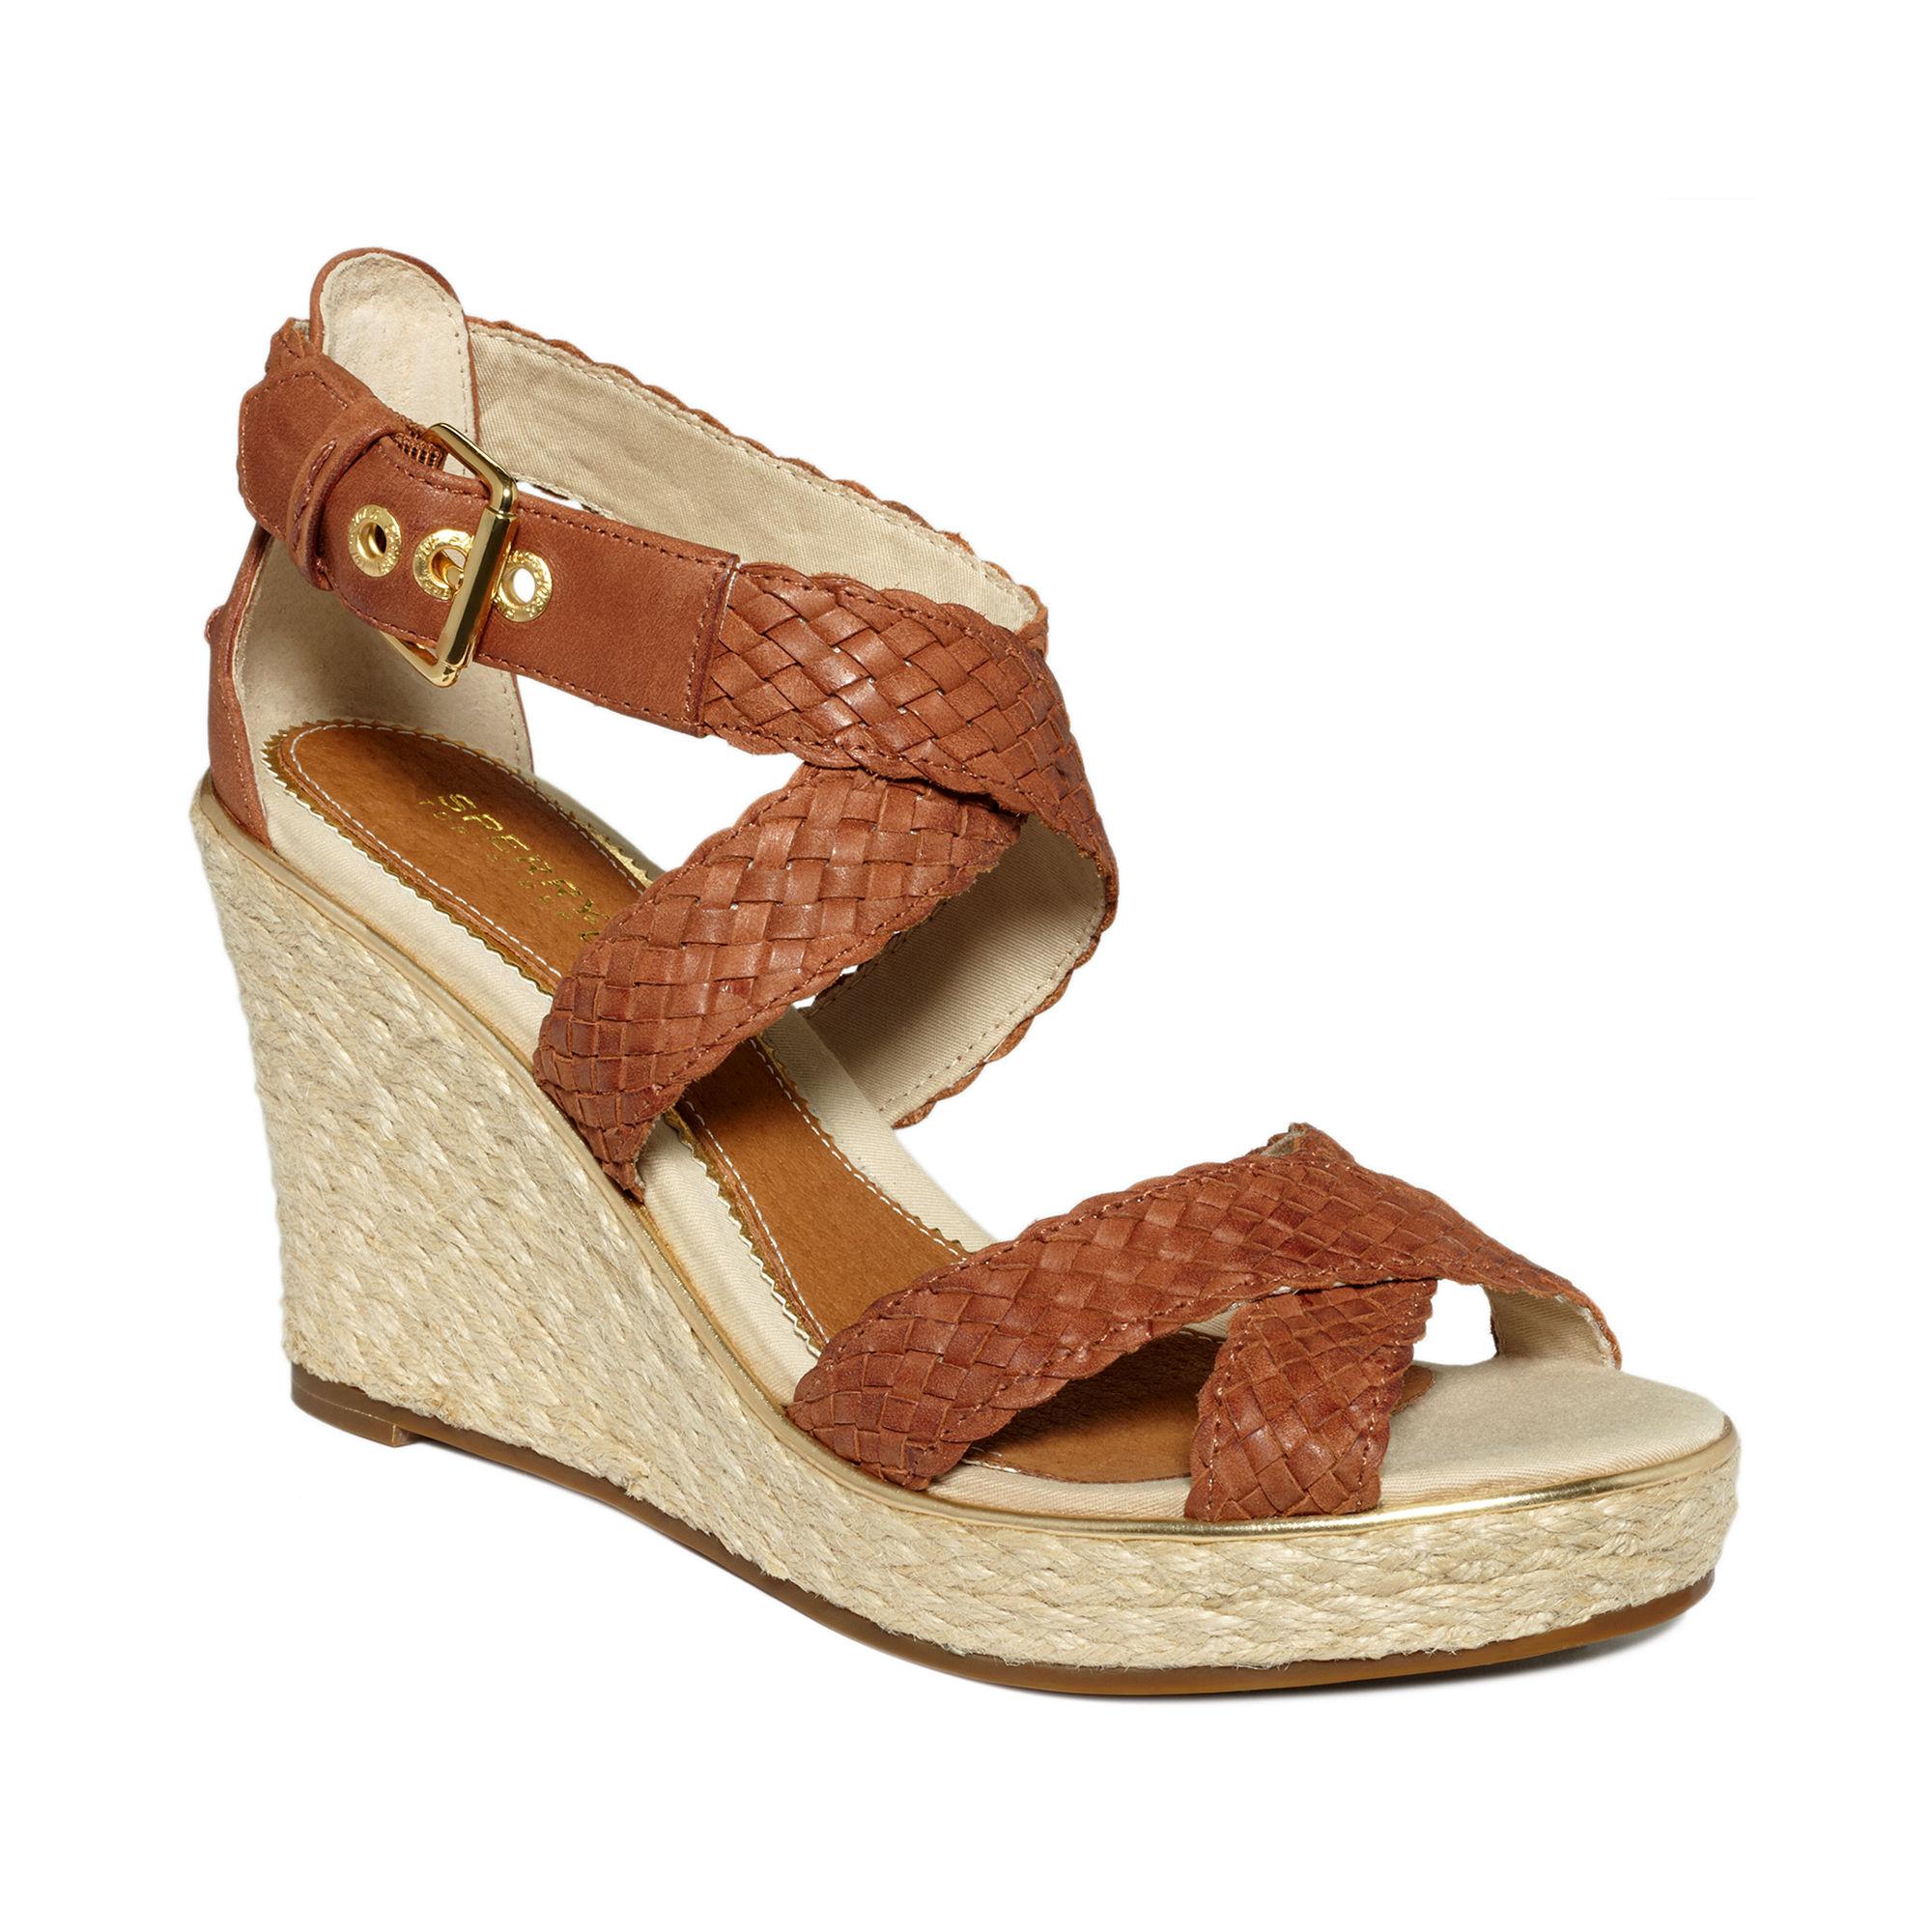 sperry top sider harbordale platform wedge sandals in